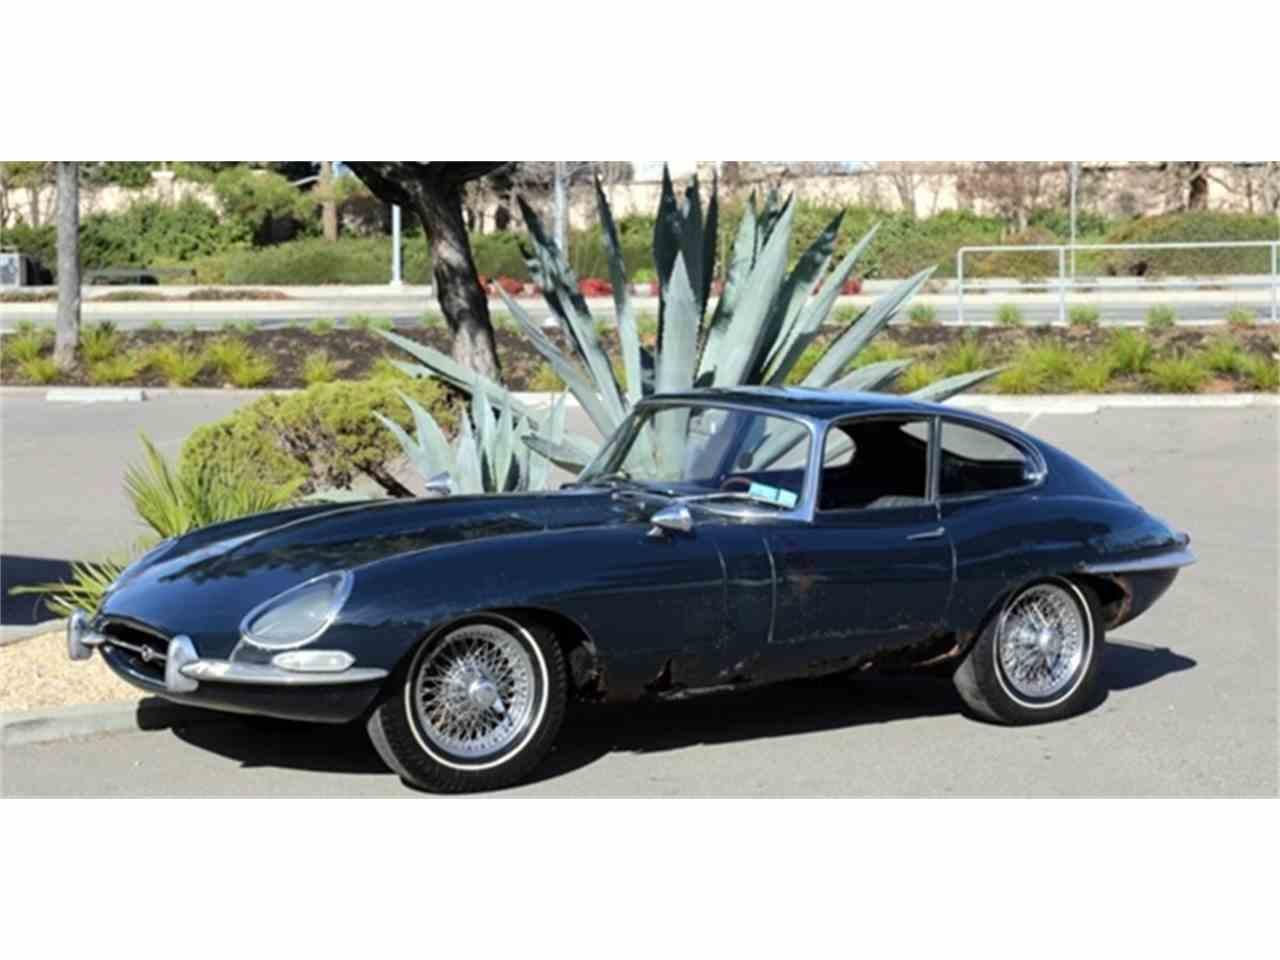 Classic Jaguar E-Type for Sale on ClassicCars.com